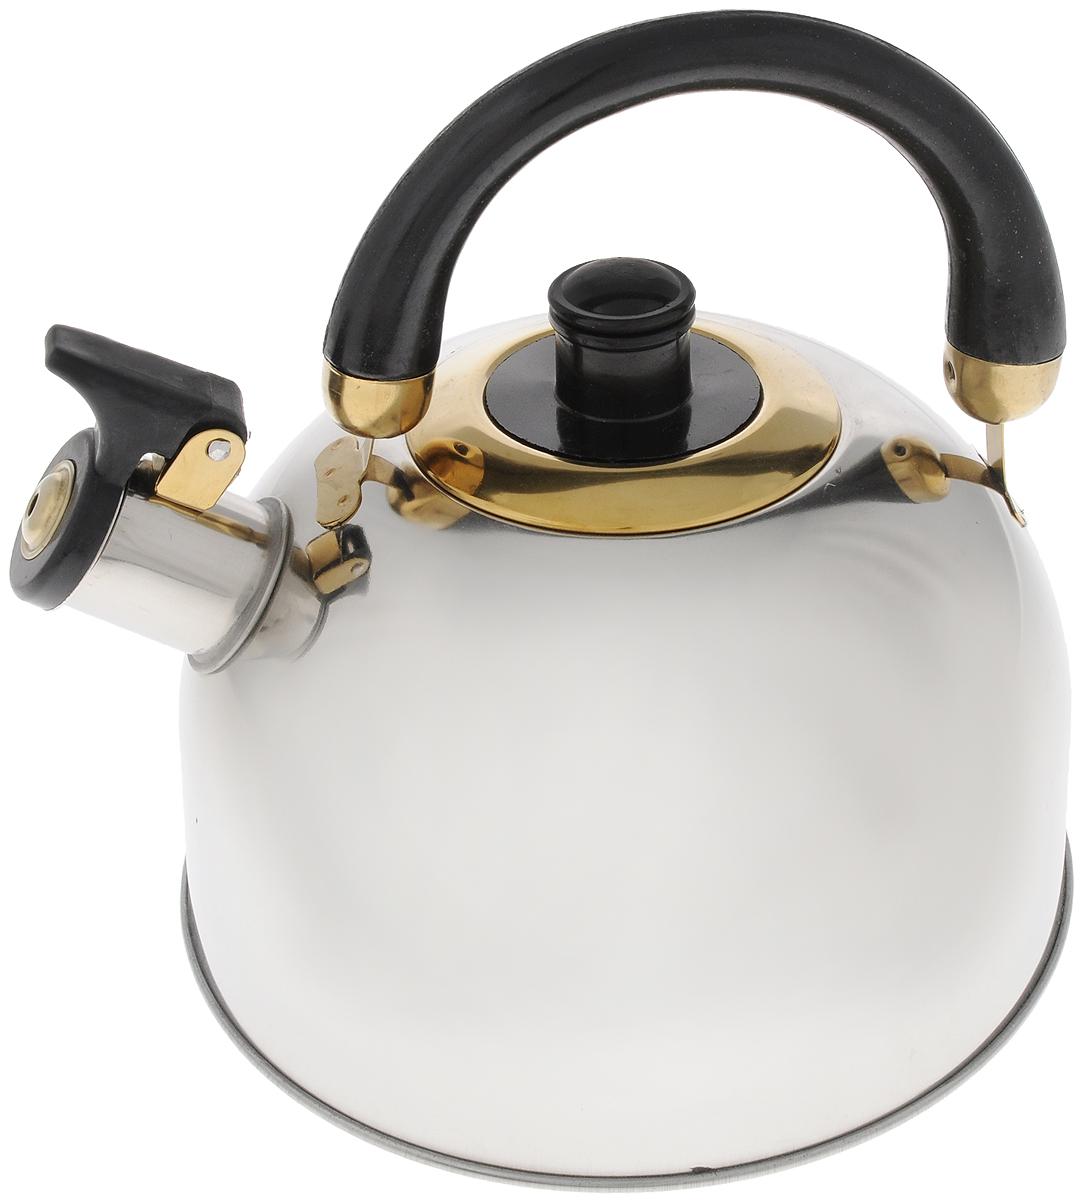 Чайник Hoffmann, со свистком, 2,5 л. НМ 5519НМ 5519